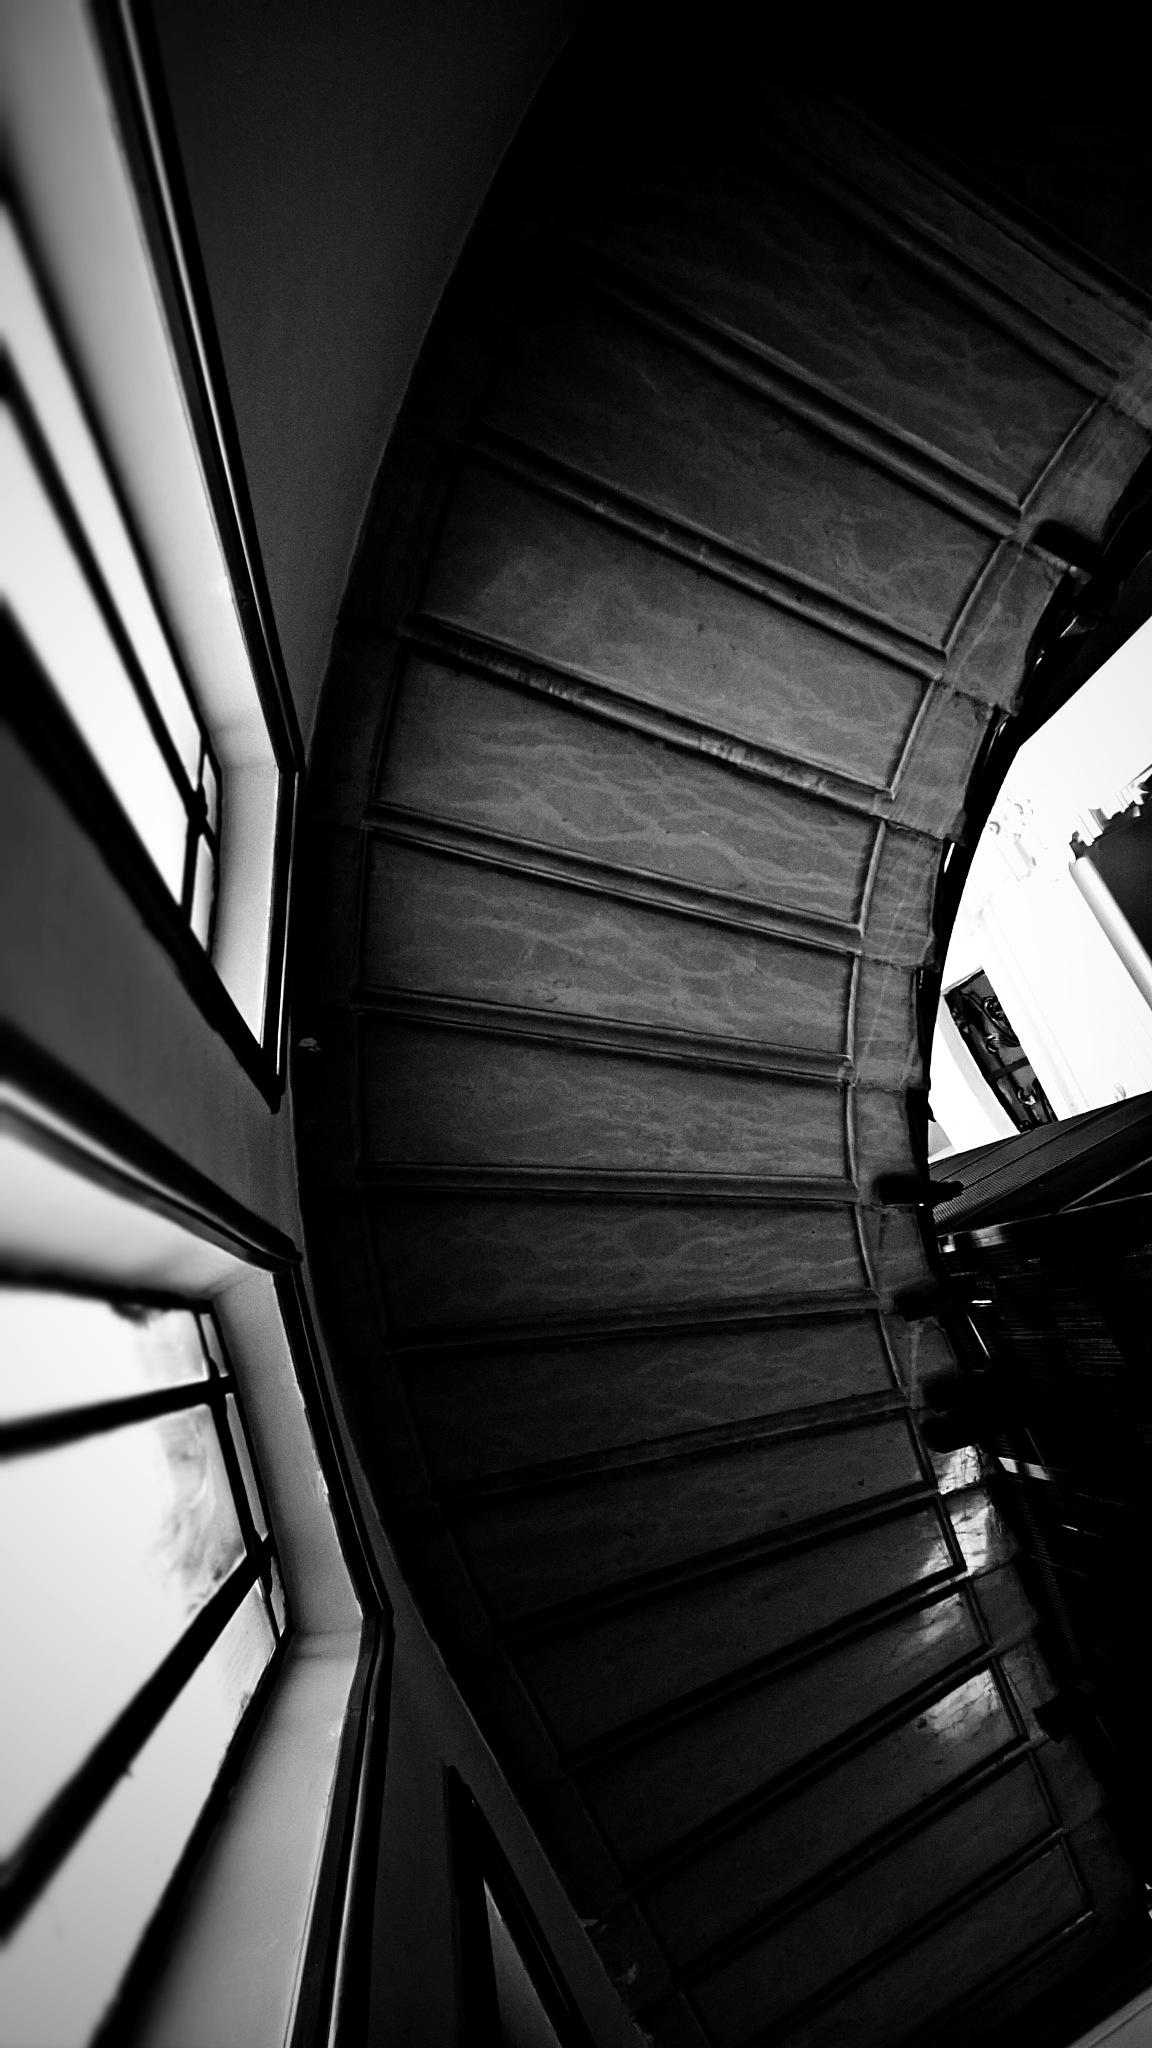 Stairway by Gabriella Bergna